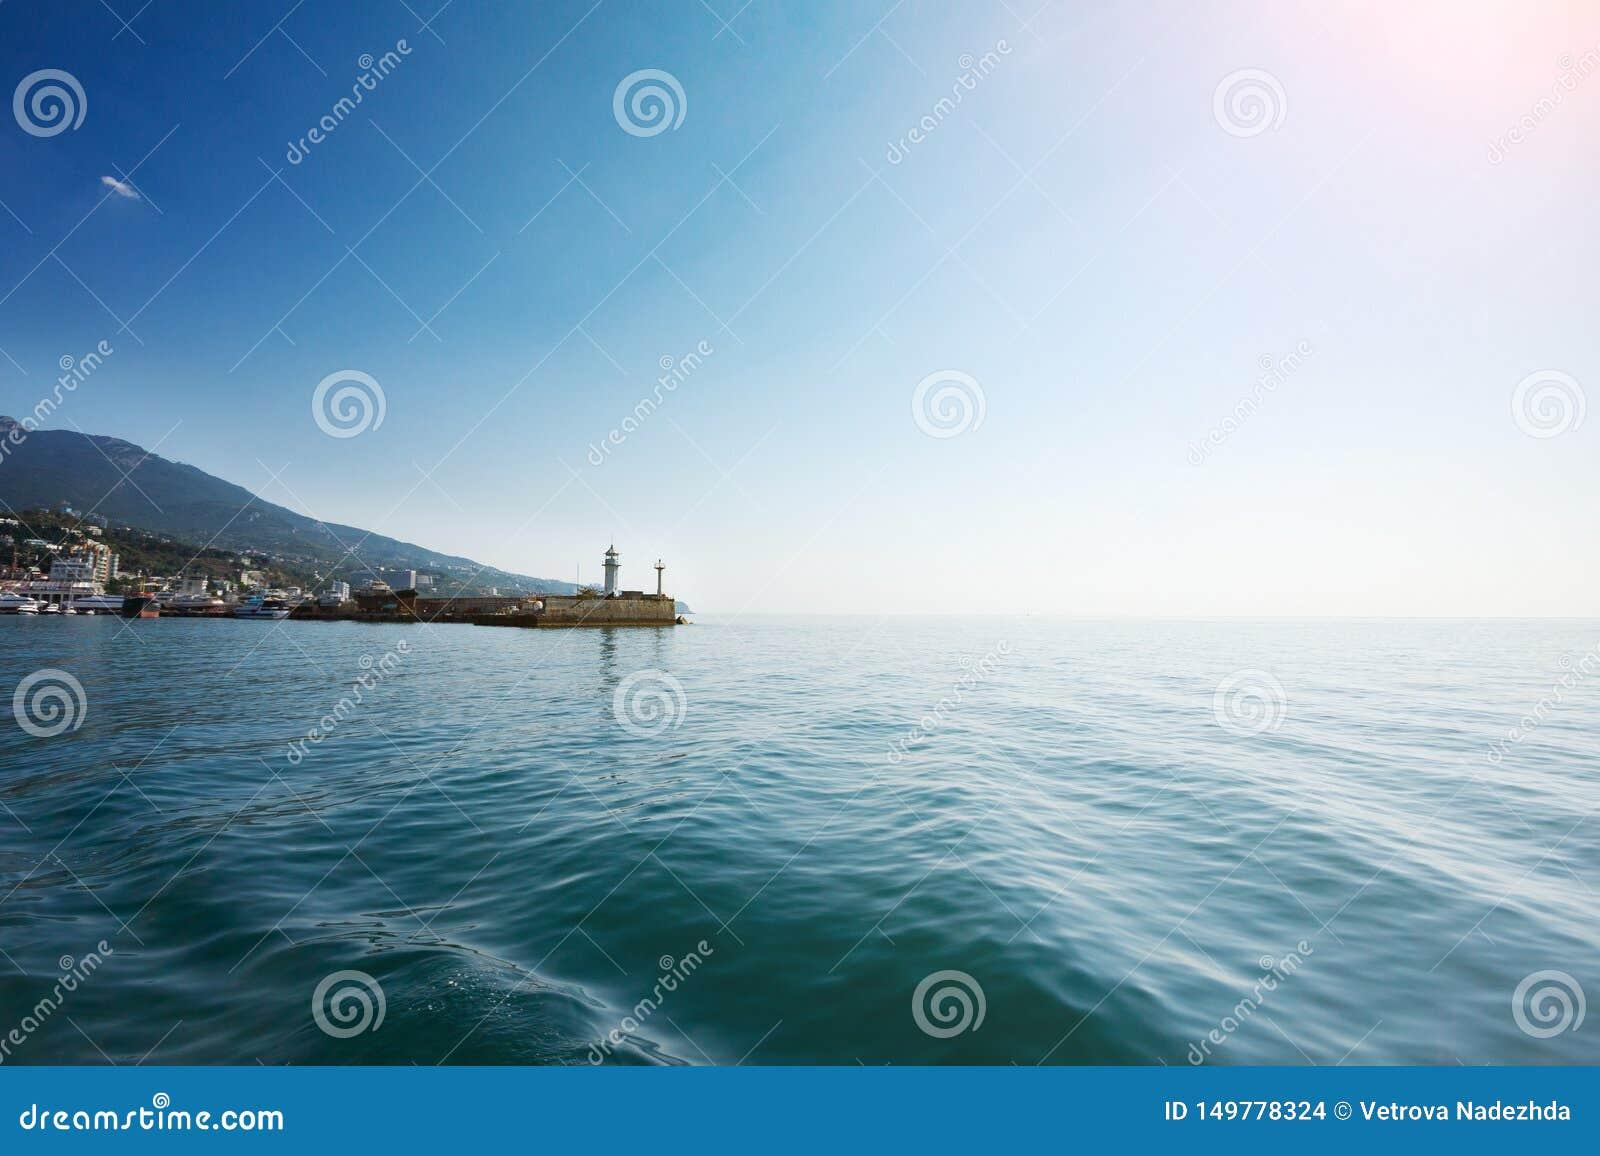 Latarnia morska na tle góry i niebieskie niebo